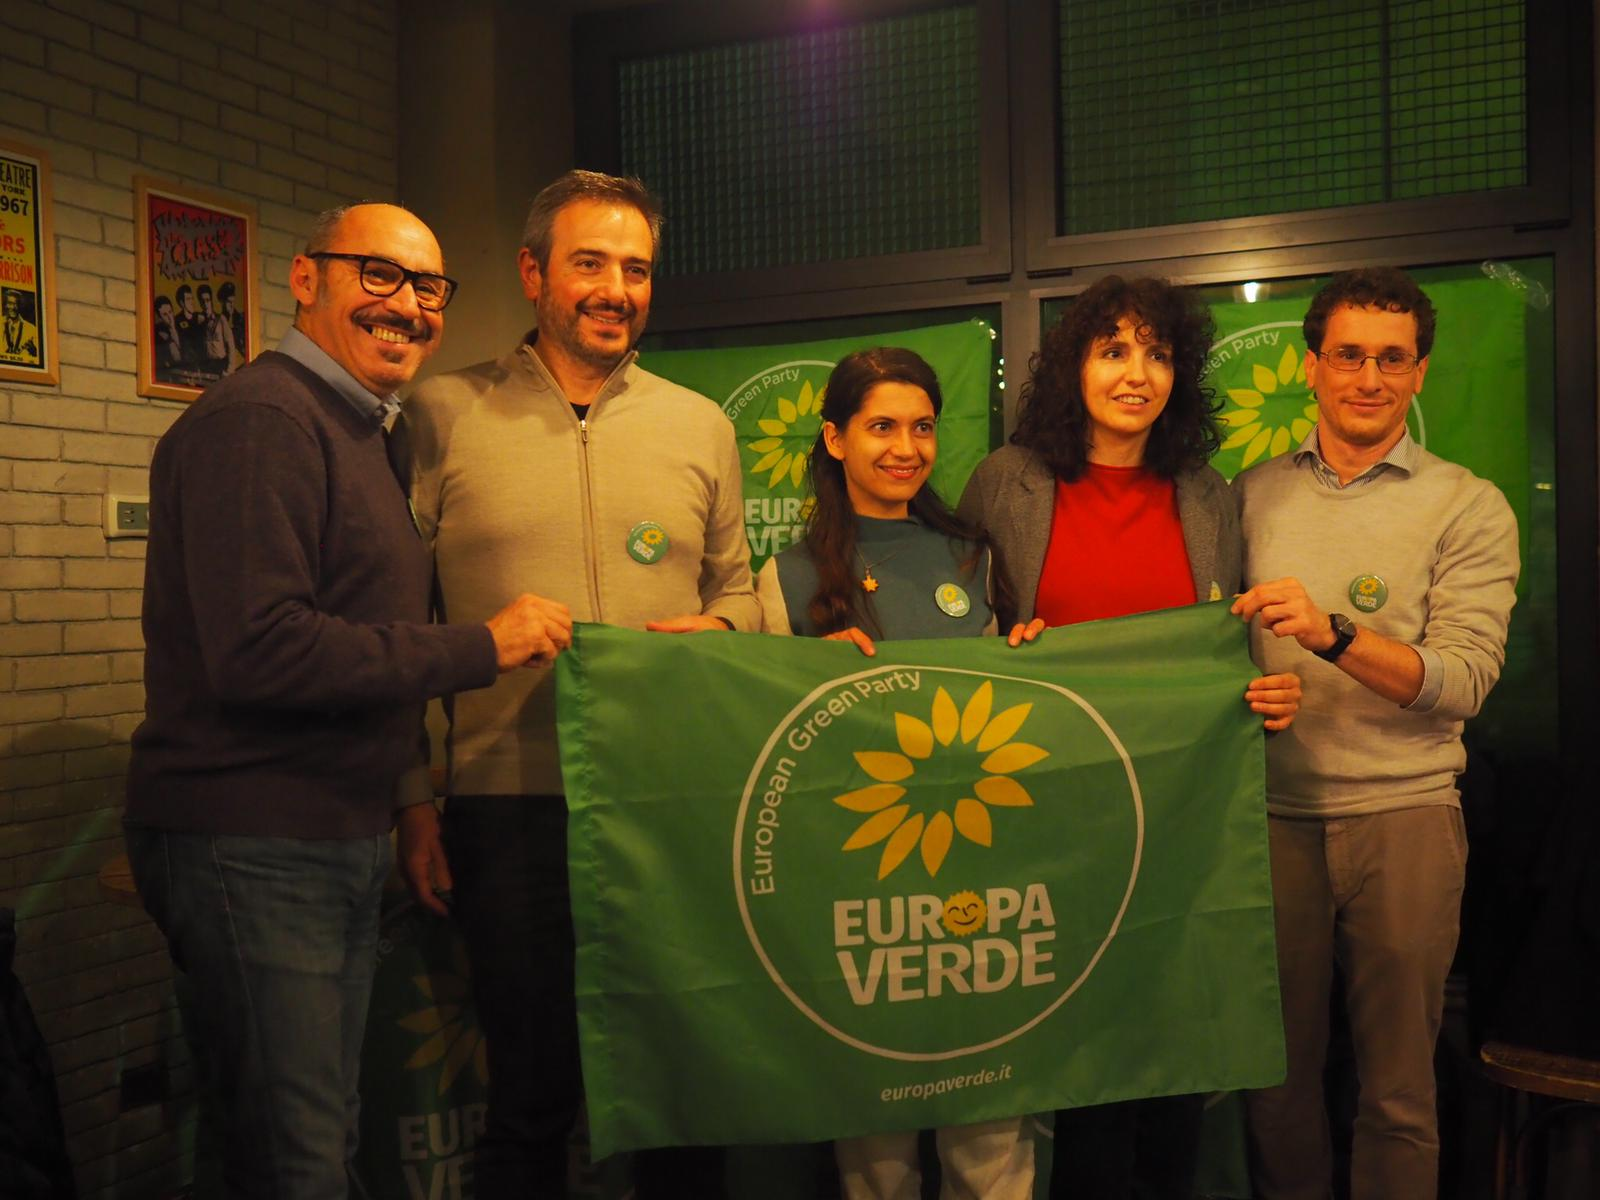 Europa-Verde-Forlì-Verdi